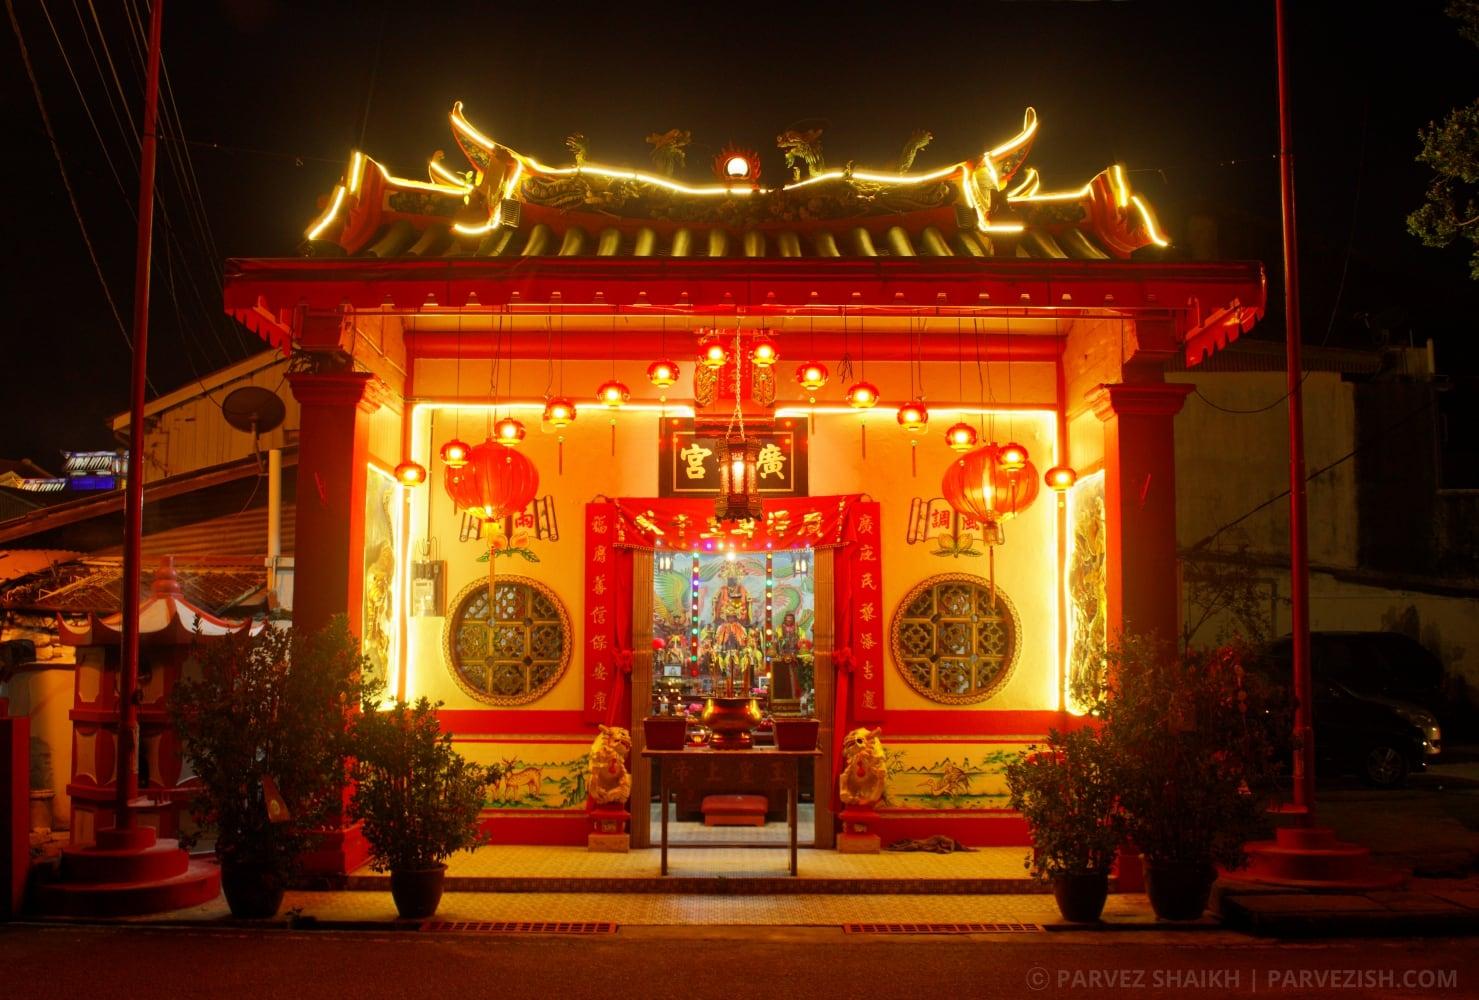 Cheng Hoon Teng Temple Malacca